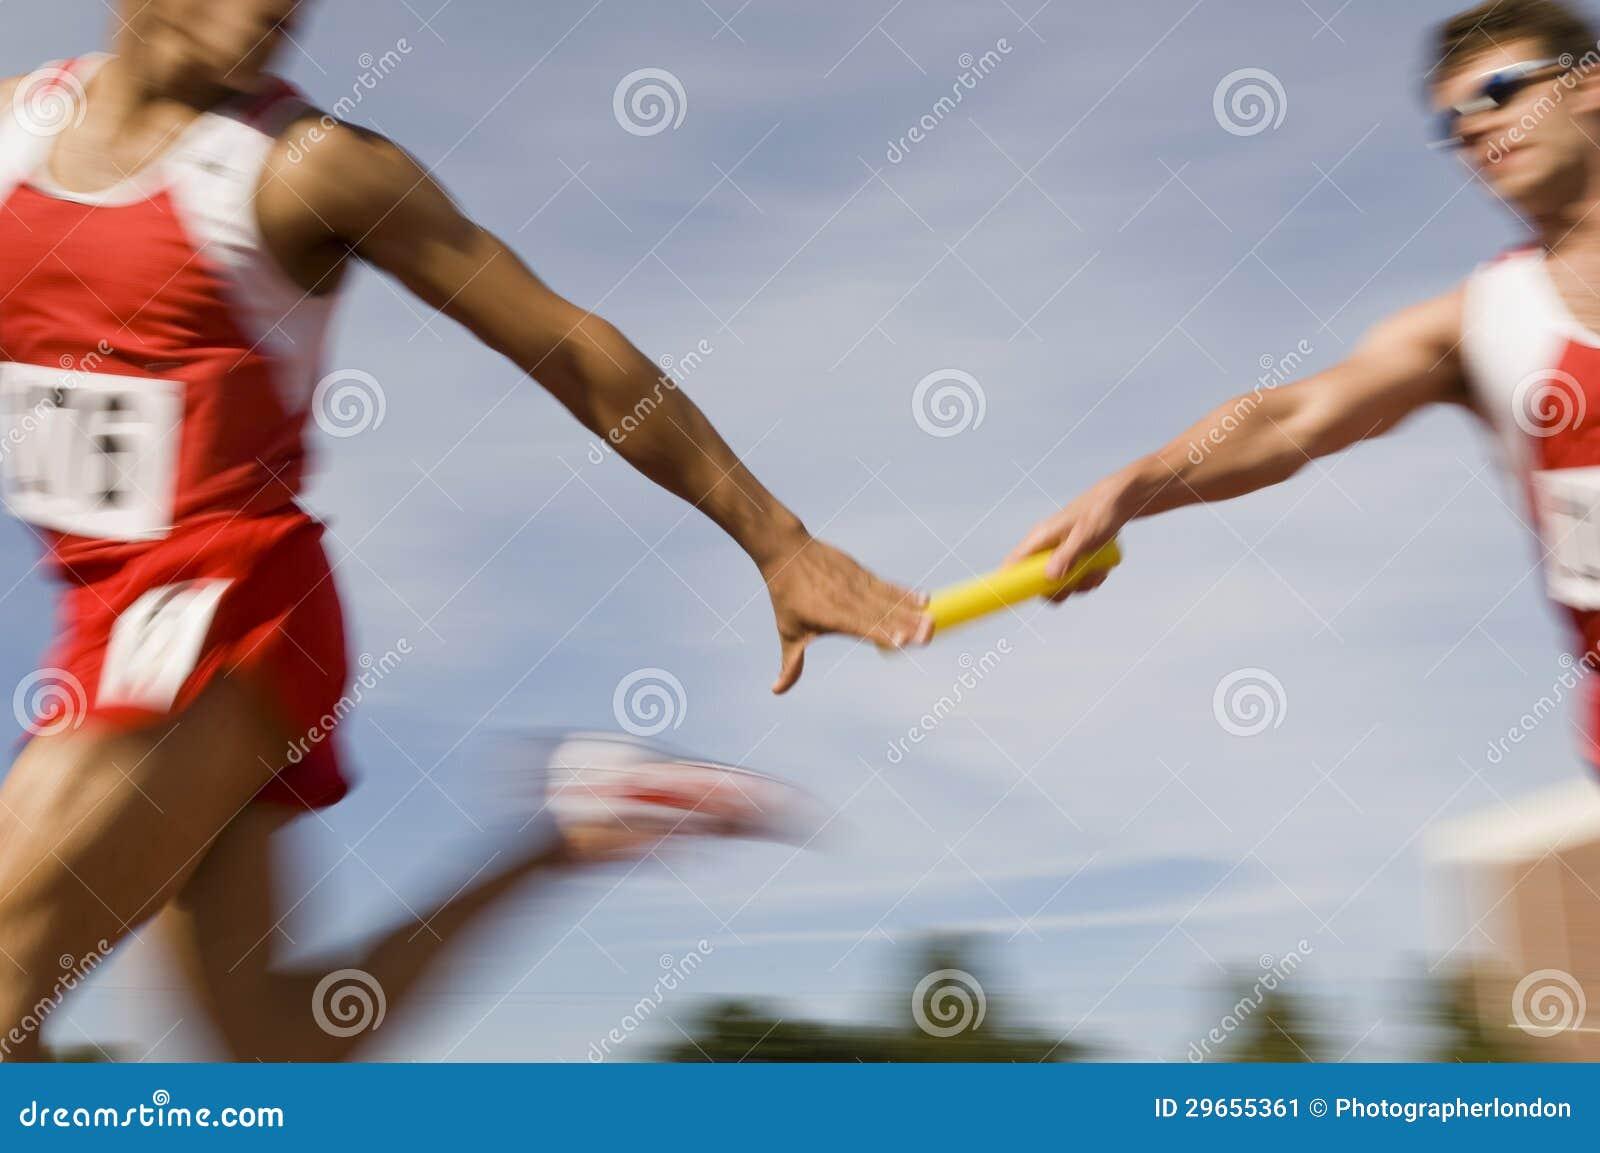 Runners Passing Baton In Relay Race